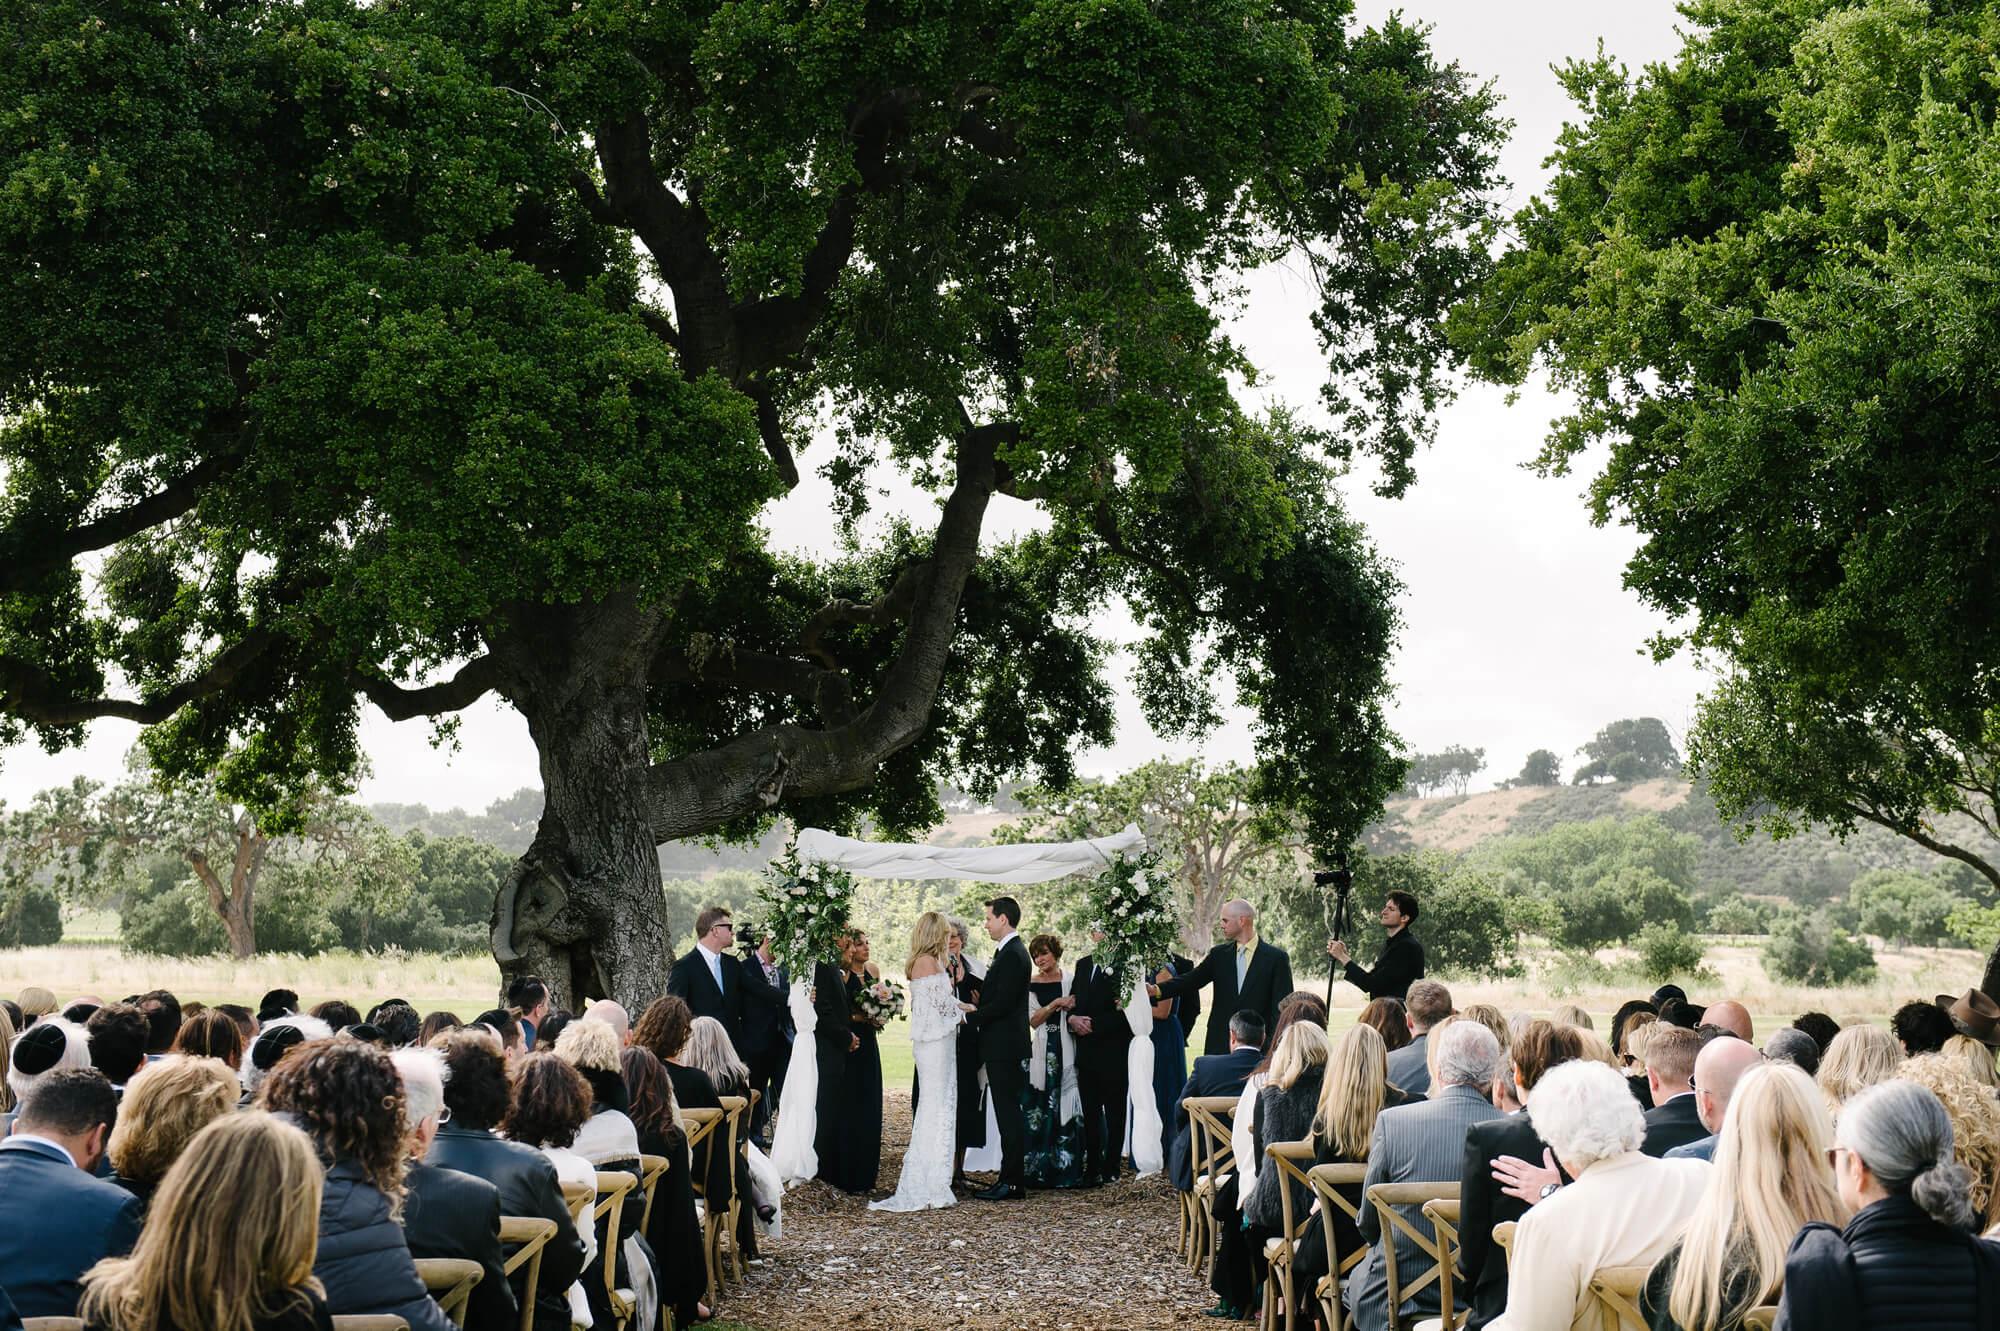 los-olivos-firestone-winery-destination-wedding-central-coast-wedding-photographer-11.jpg